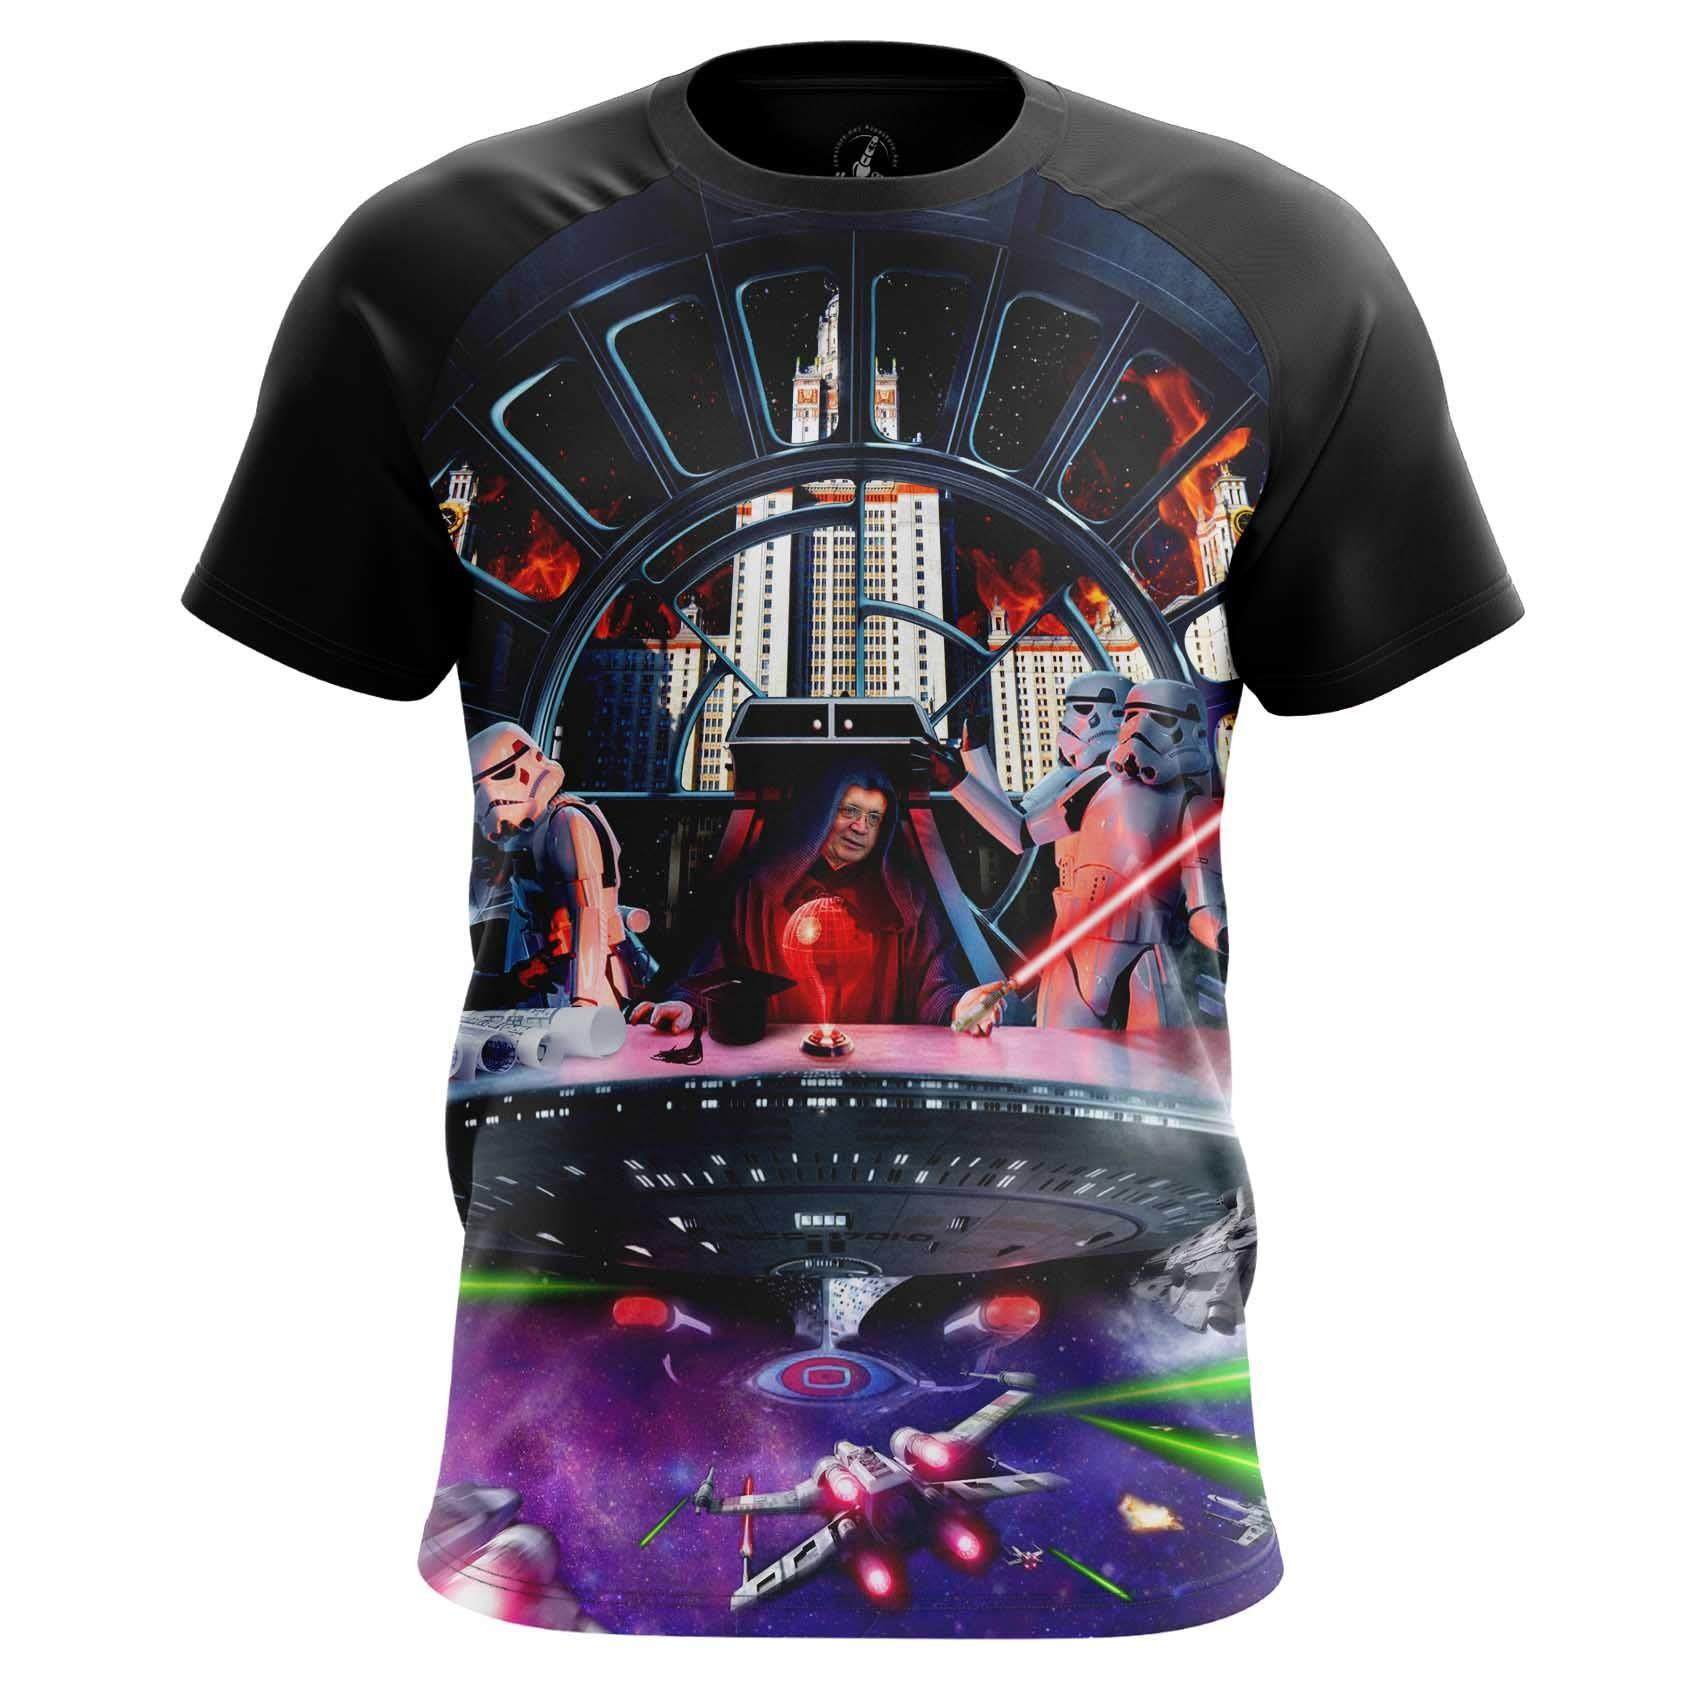 Merchandise Men'S Tank Msu Strikes Back Star Wars Sith Shirt Vest